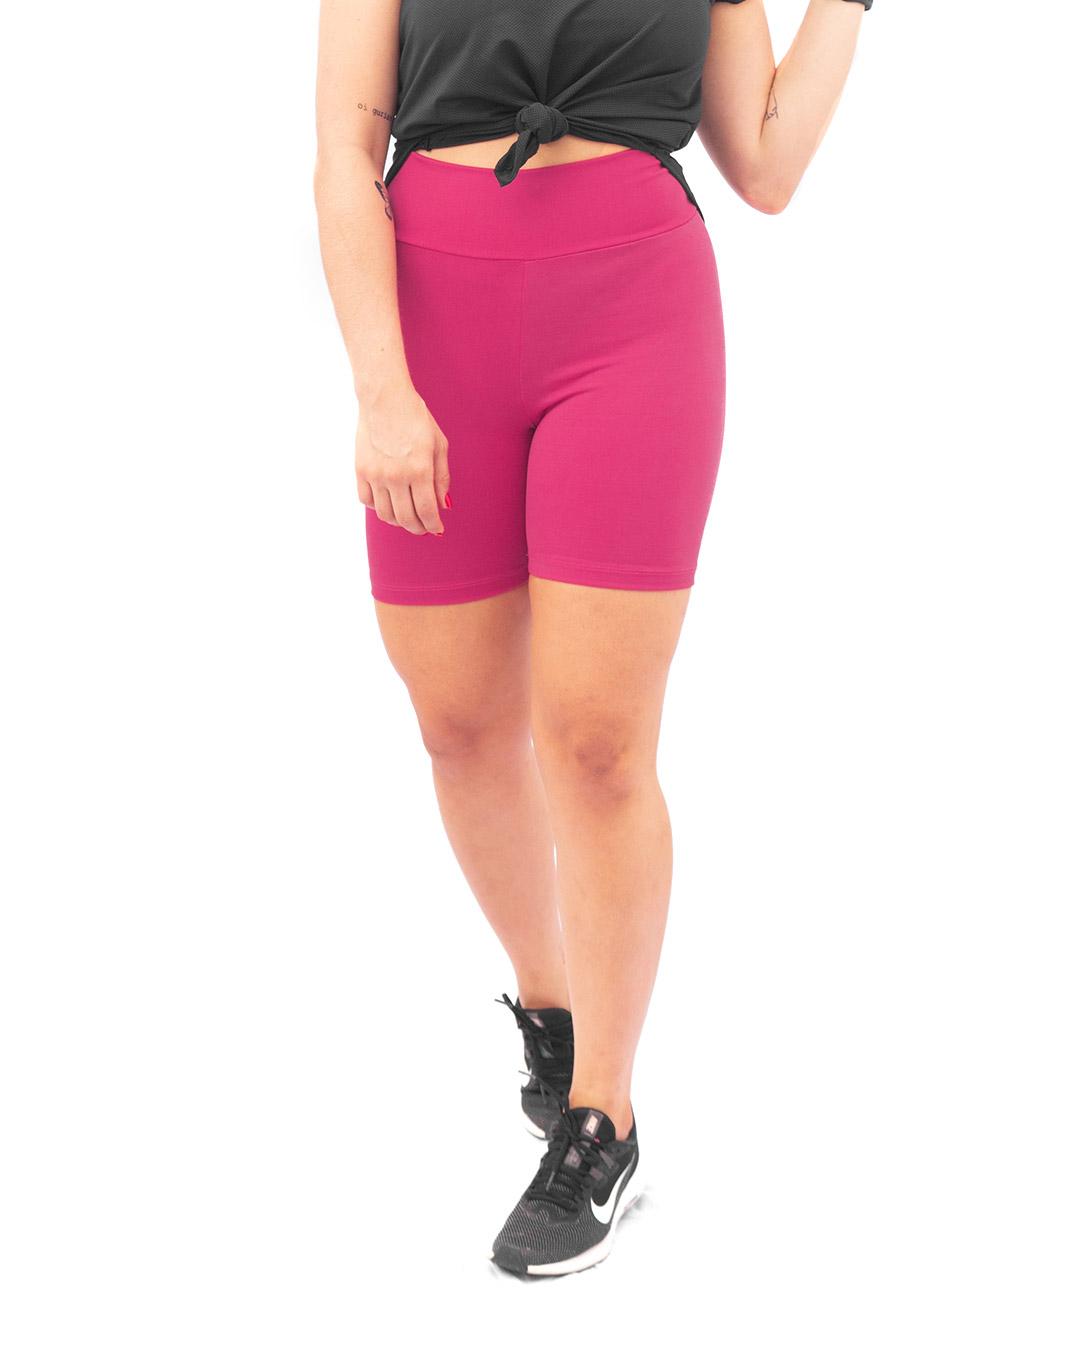 Shorts Fitness Básico Cintura Alta - Movimente-se